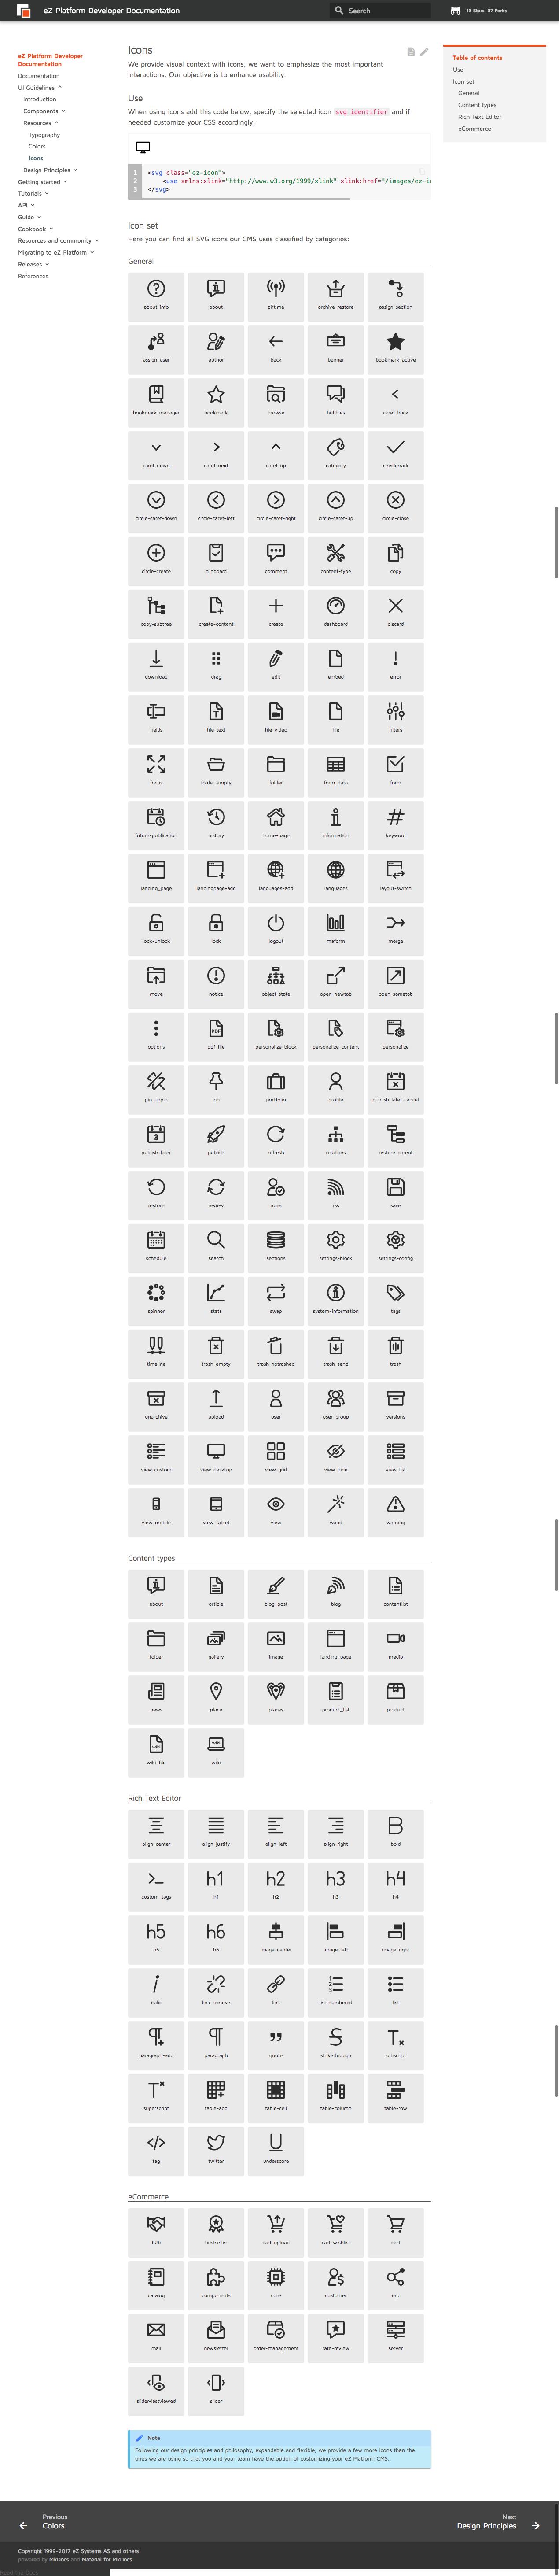 icons - ez platform developer documentation 1